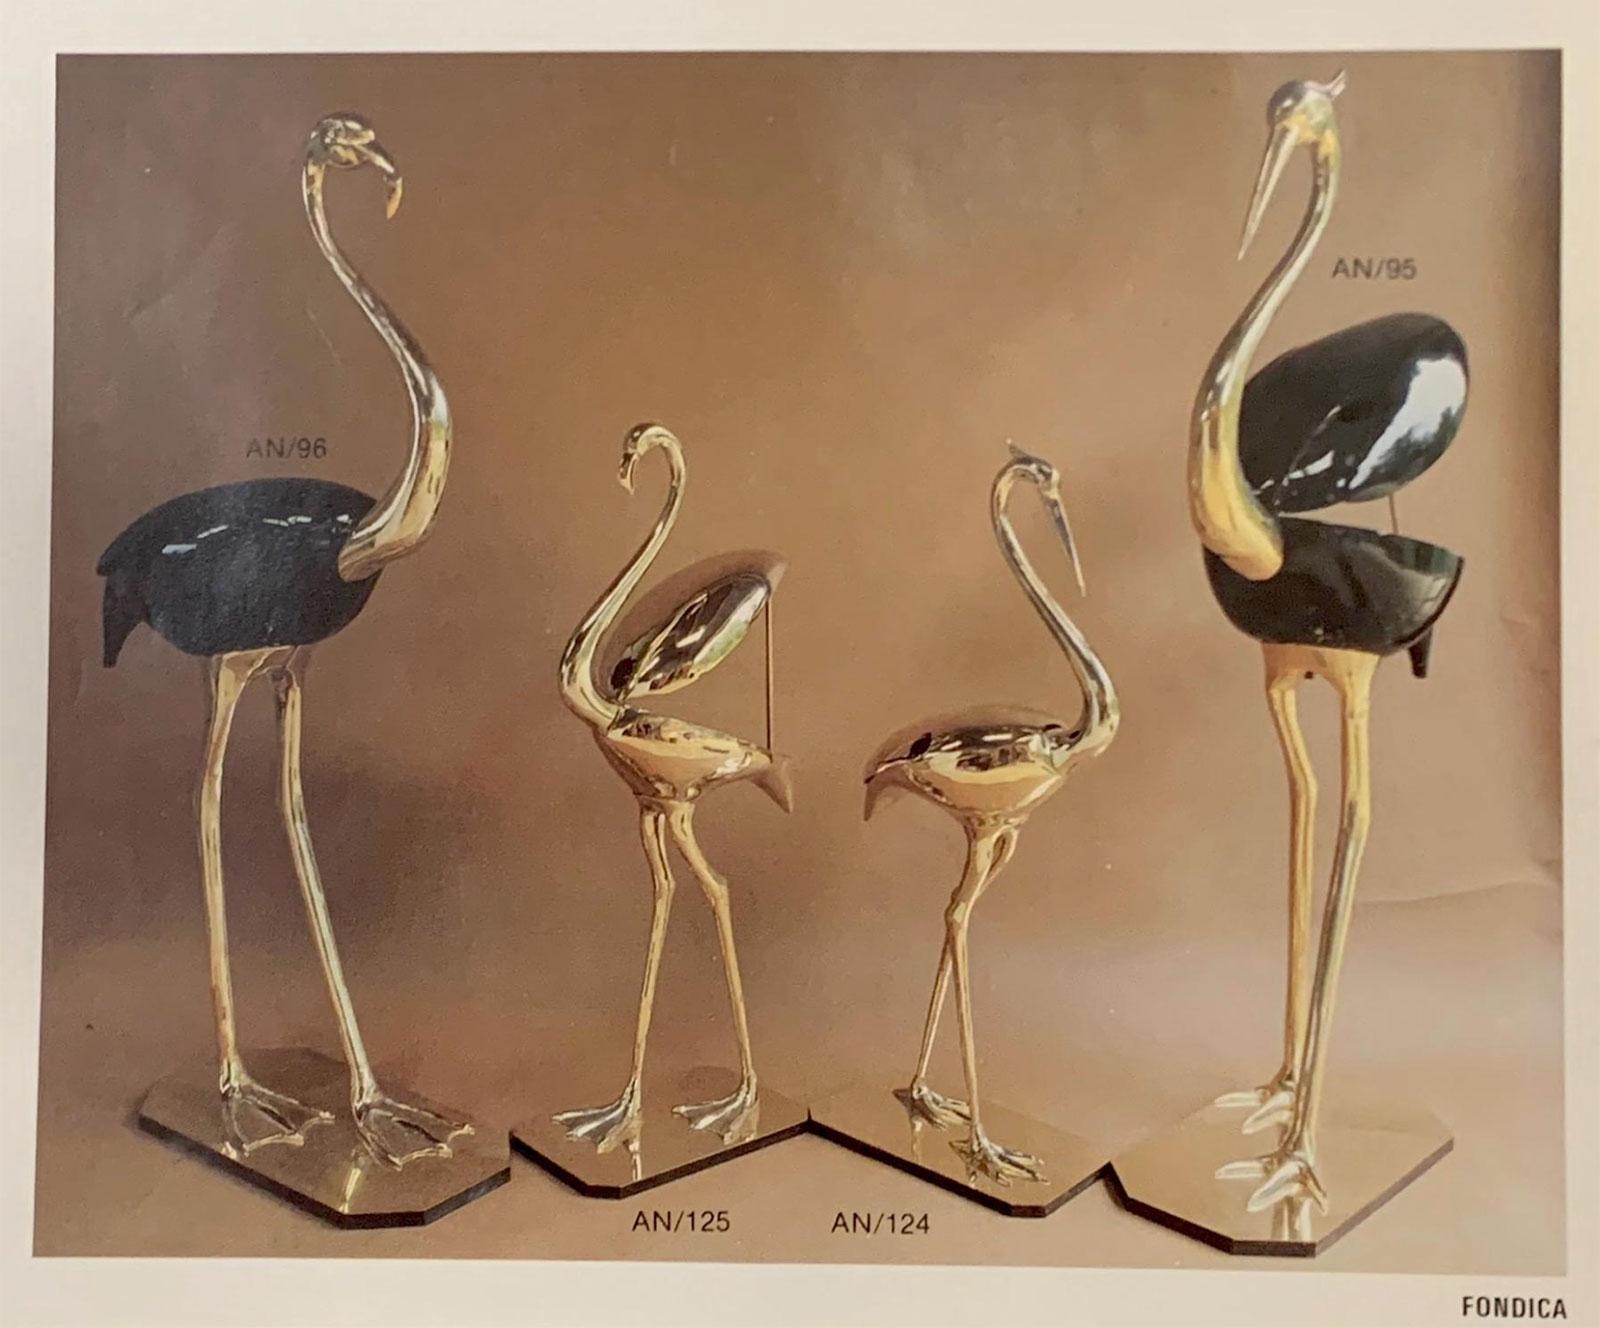 Fondica Lifesize Brass Flamingo 1970simage 8